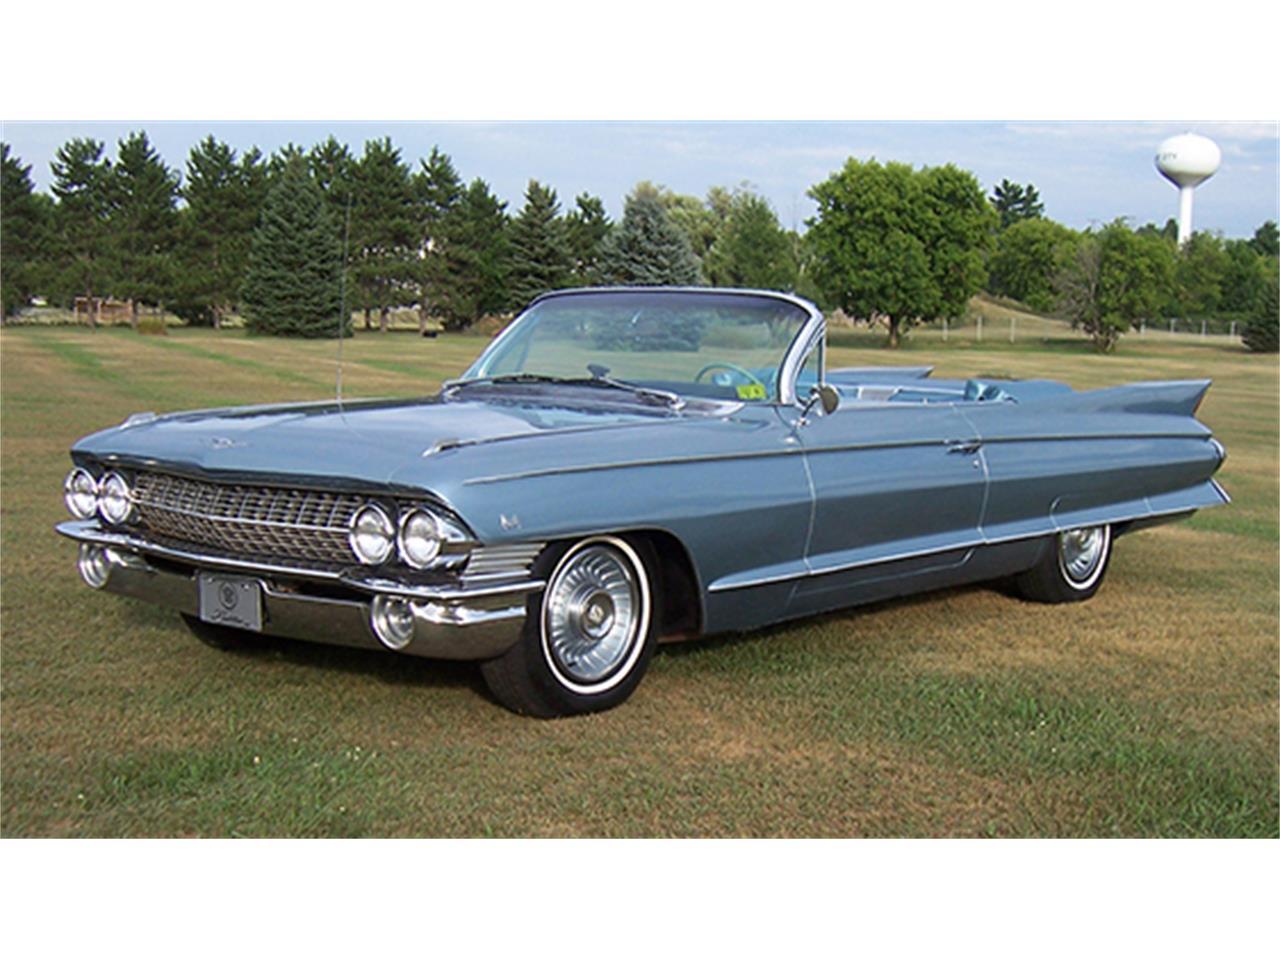 1961 Cadillac Eldorado Biarritz Convertible For Sale Classiccars El Dorado Large Picture Of 61 Ja6l